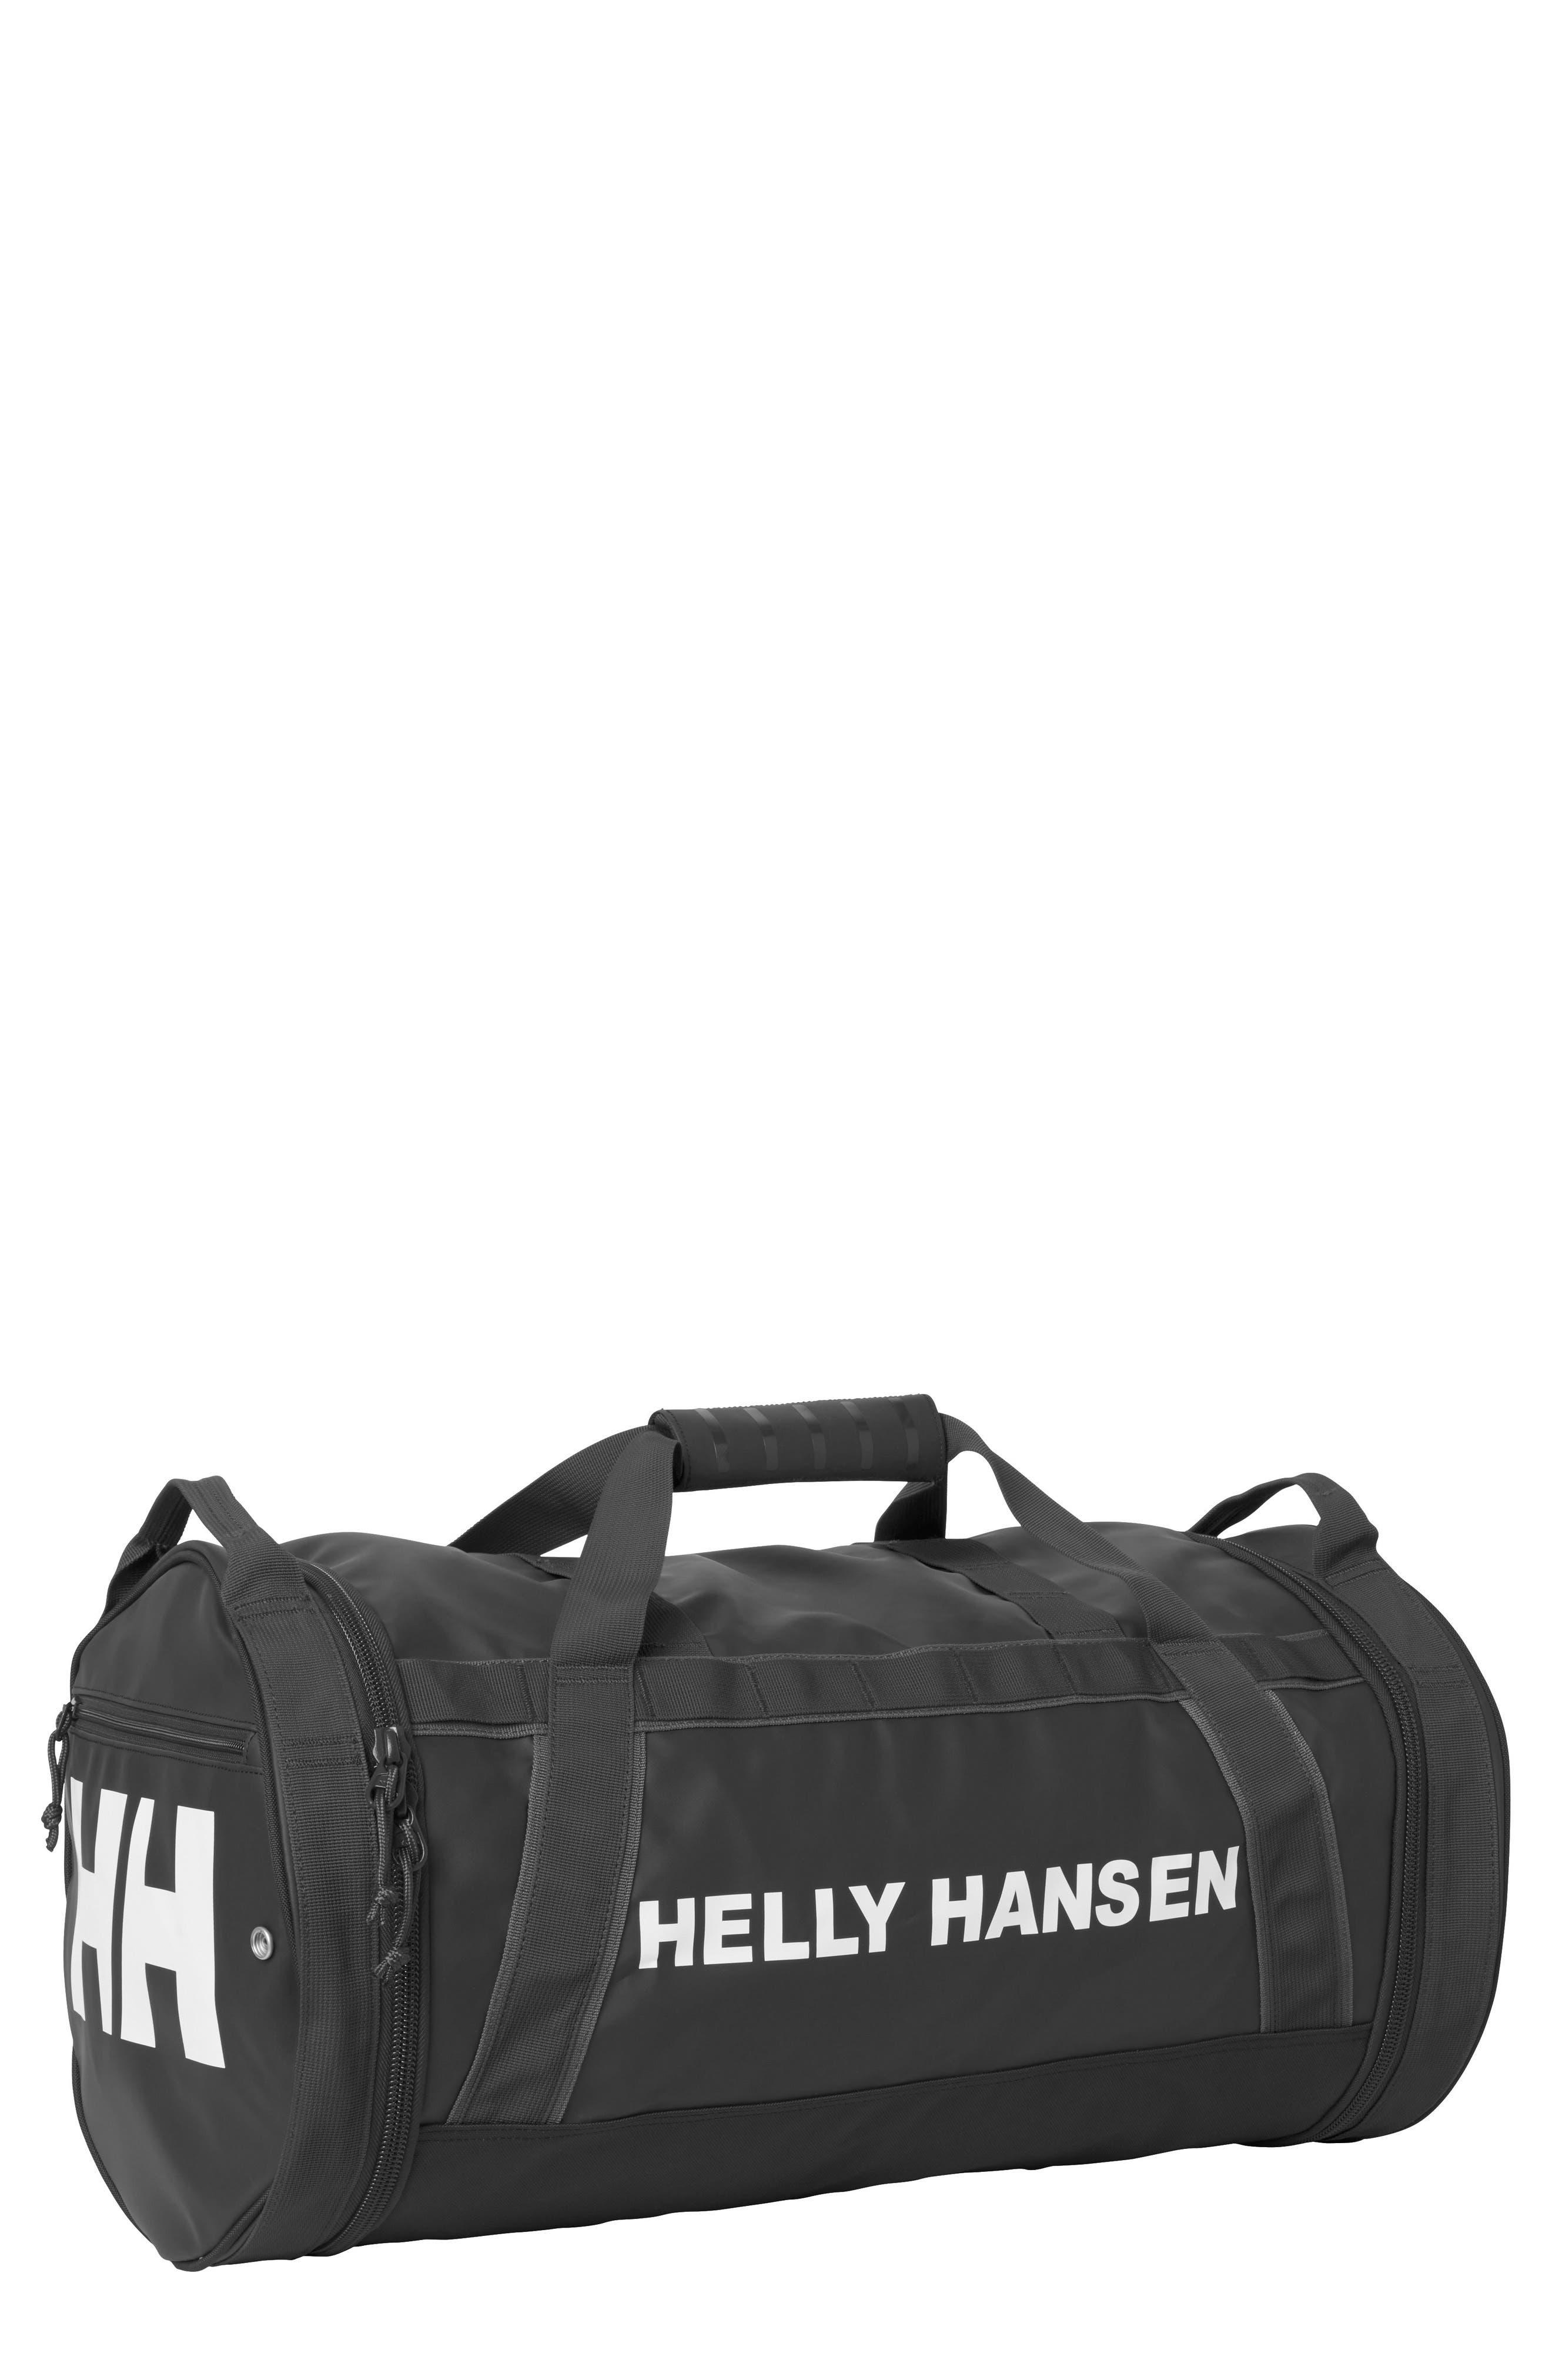 HELLY HANSEN Hellypack Duffel Bag, Main, color, BLACK